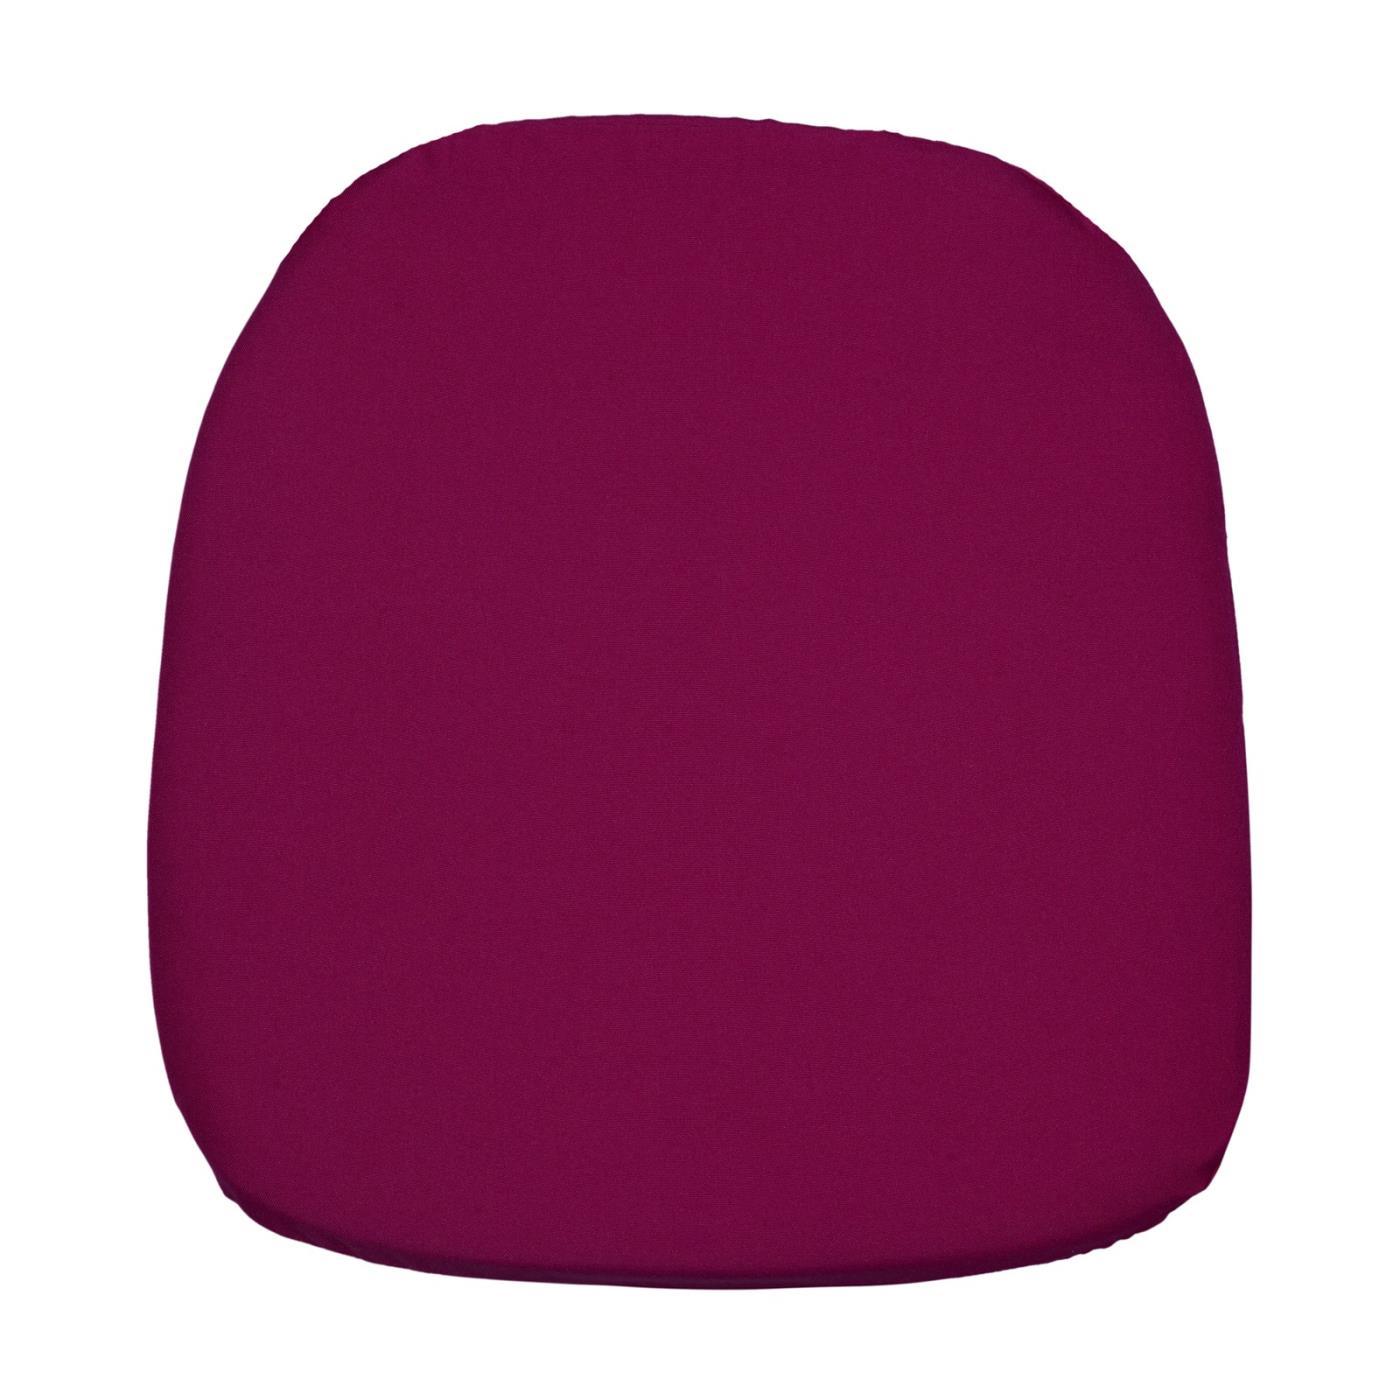 Poly Seat Cushion - Raspberry